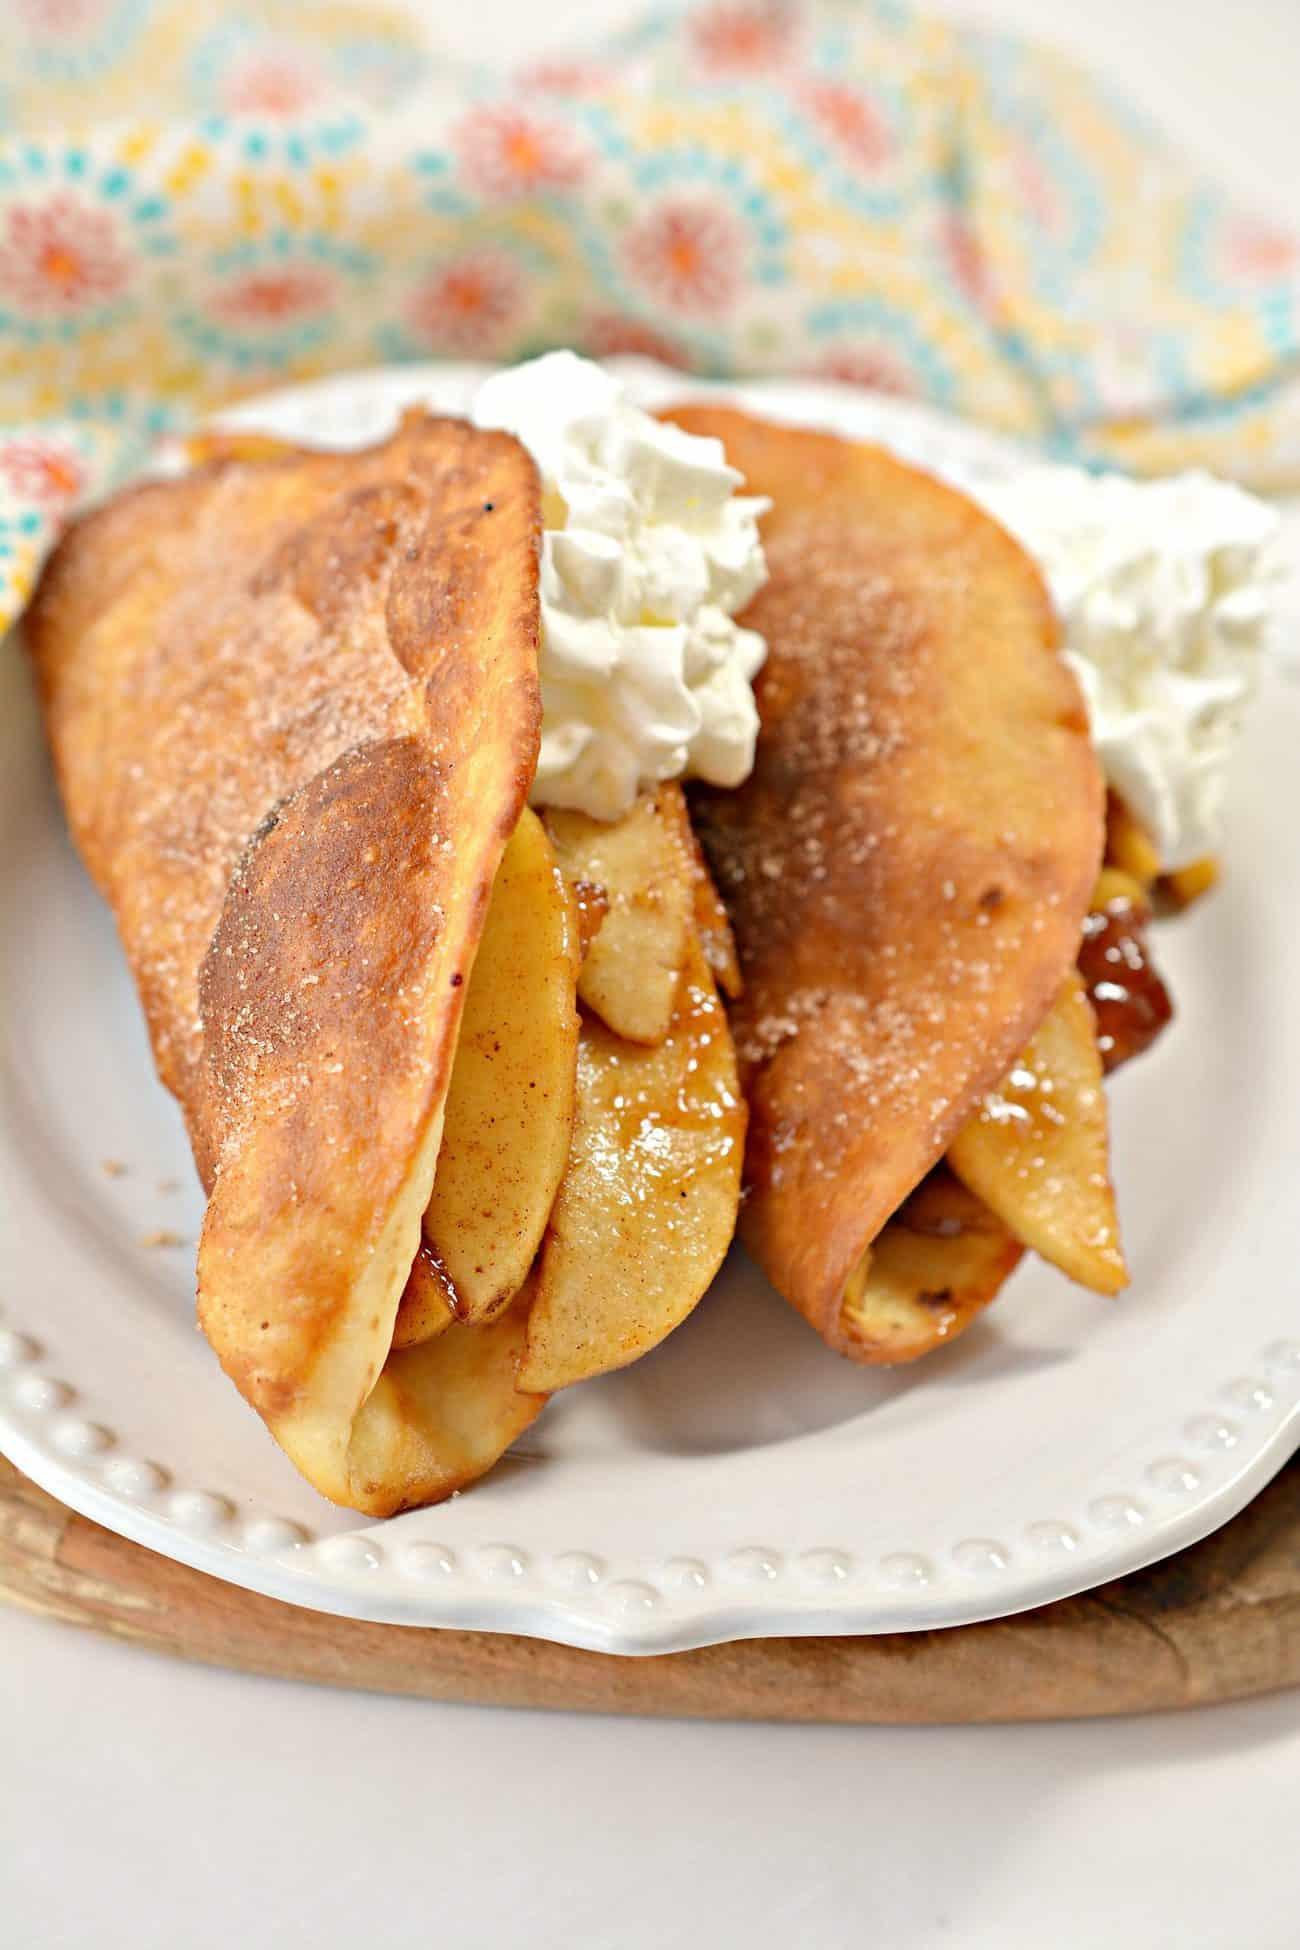 Apple Pie Tacos